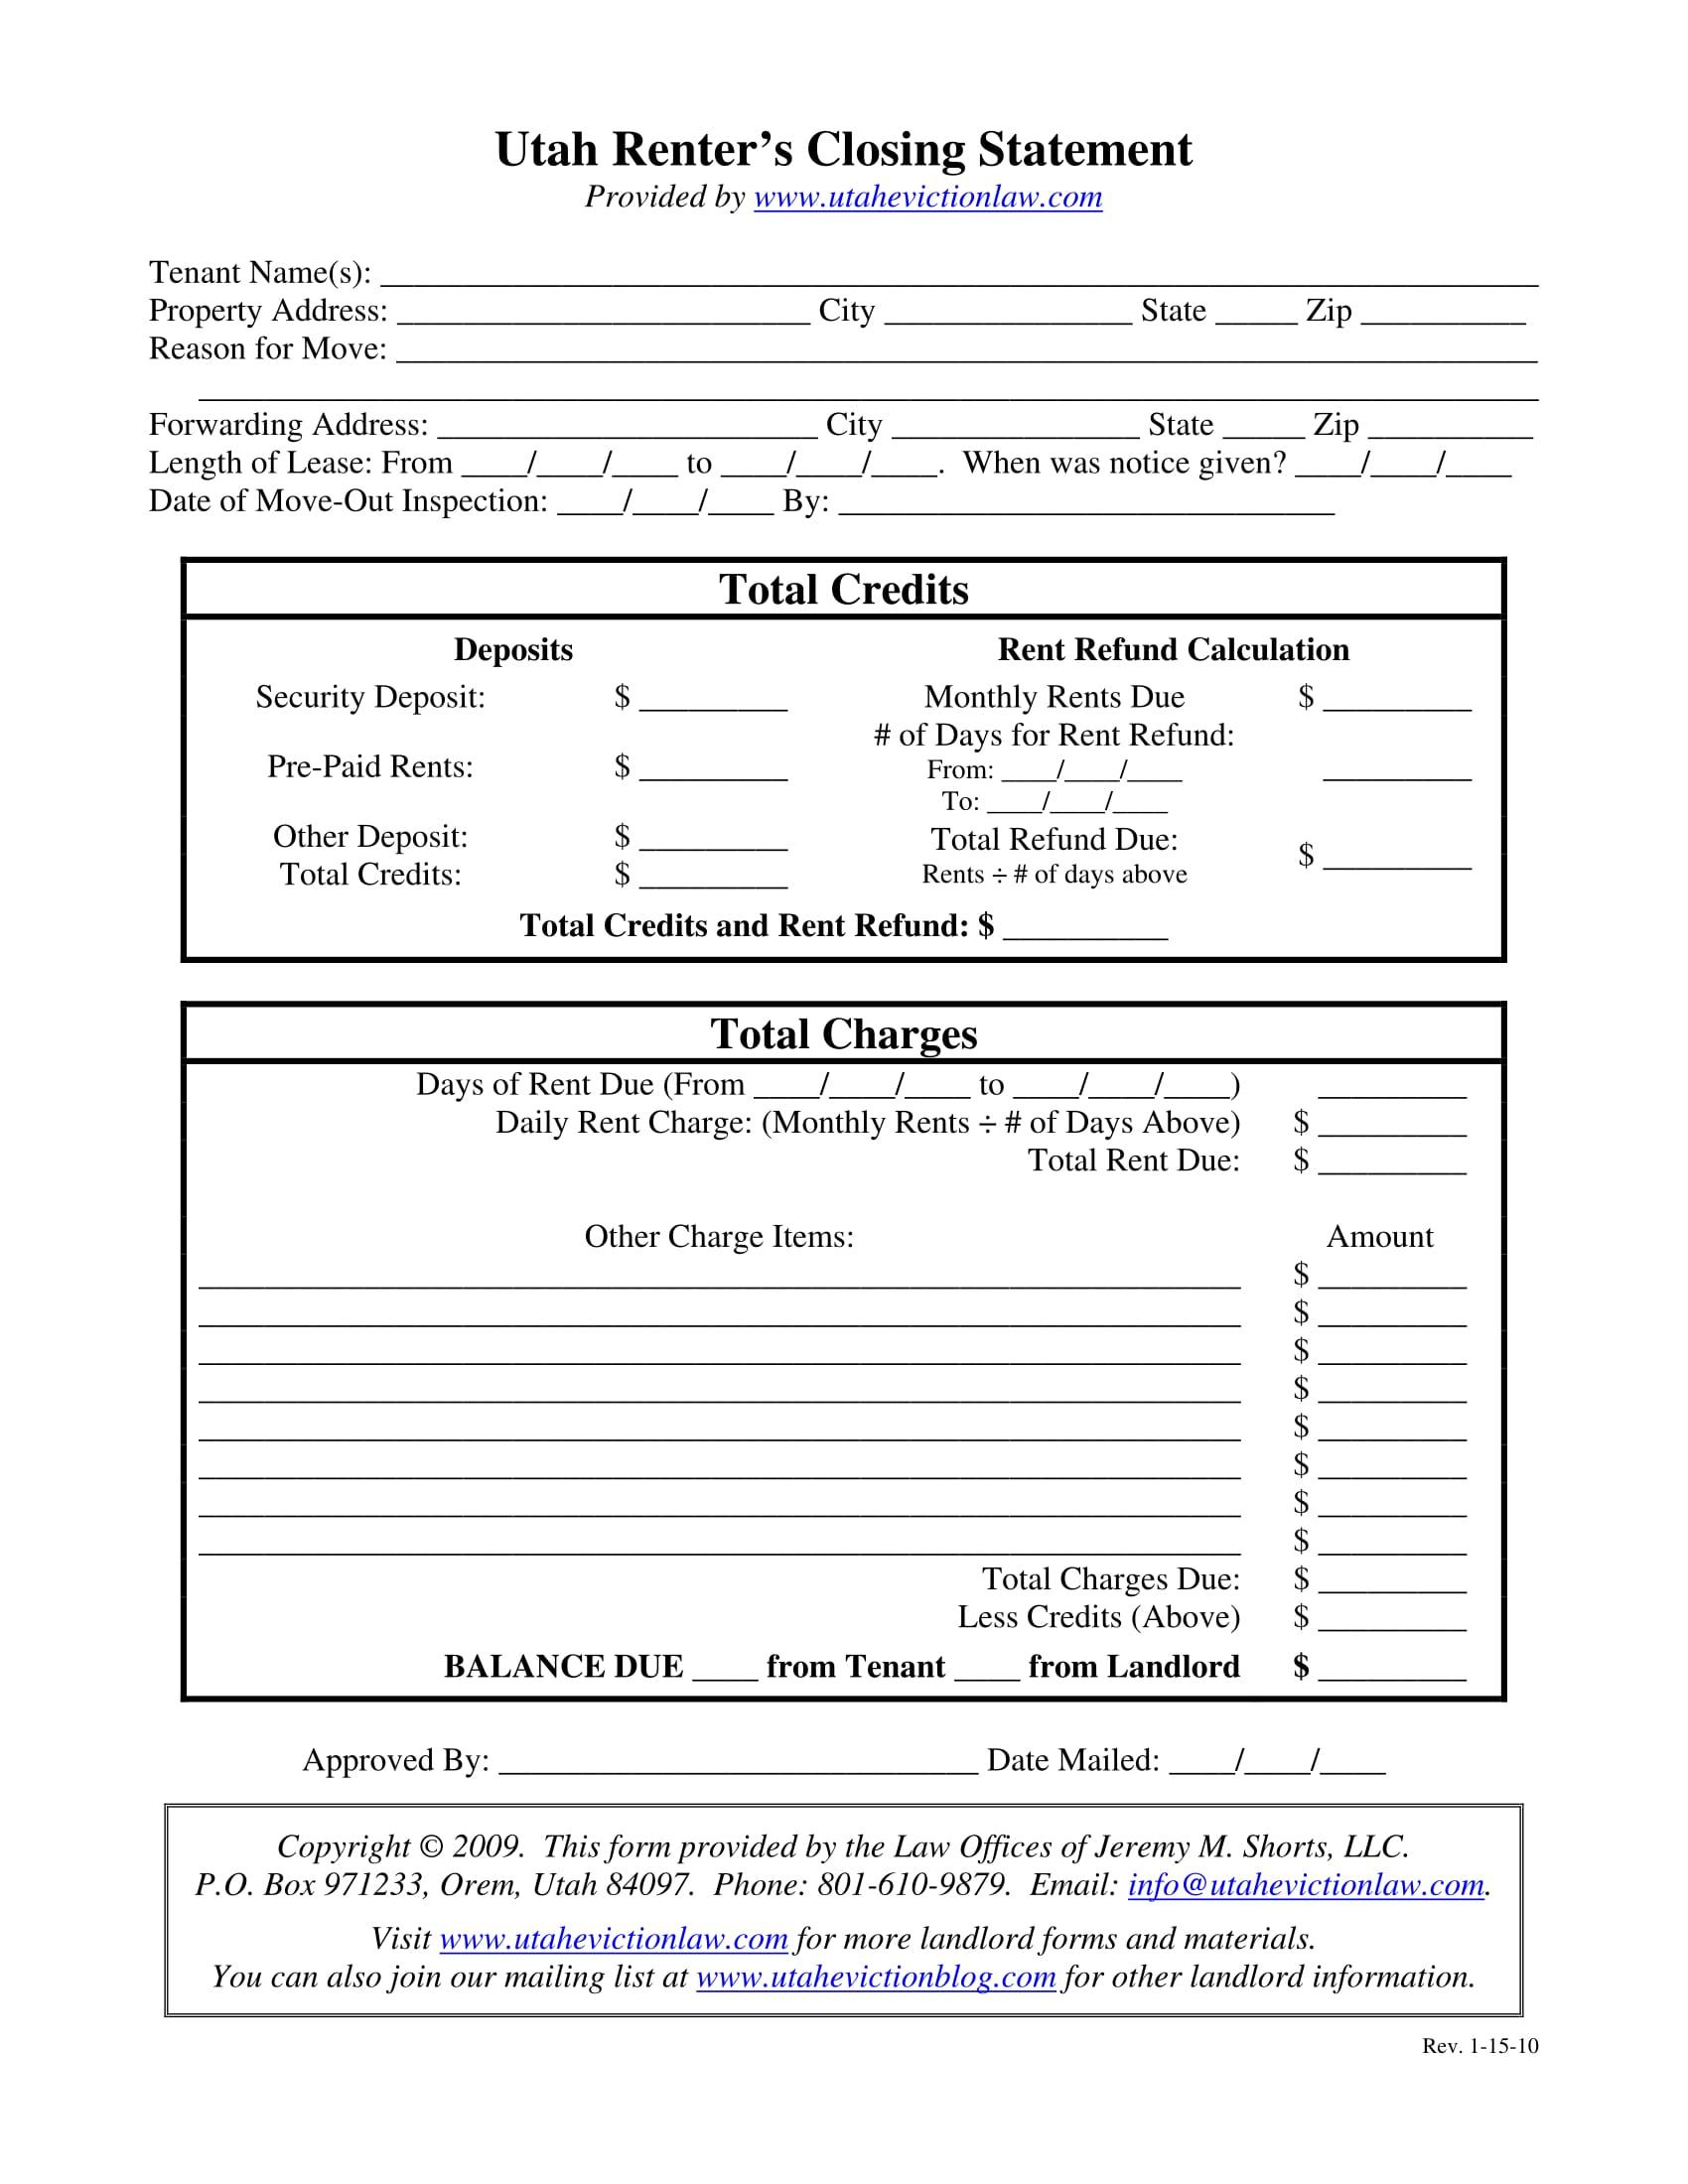 renter closing statement form 1